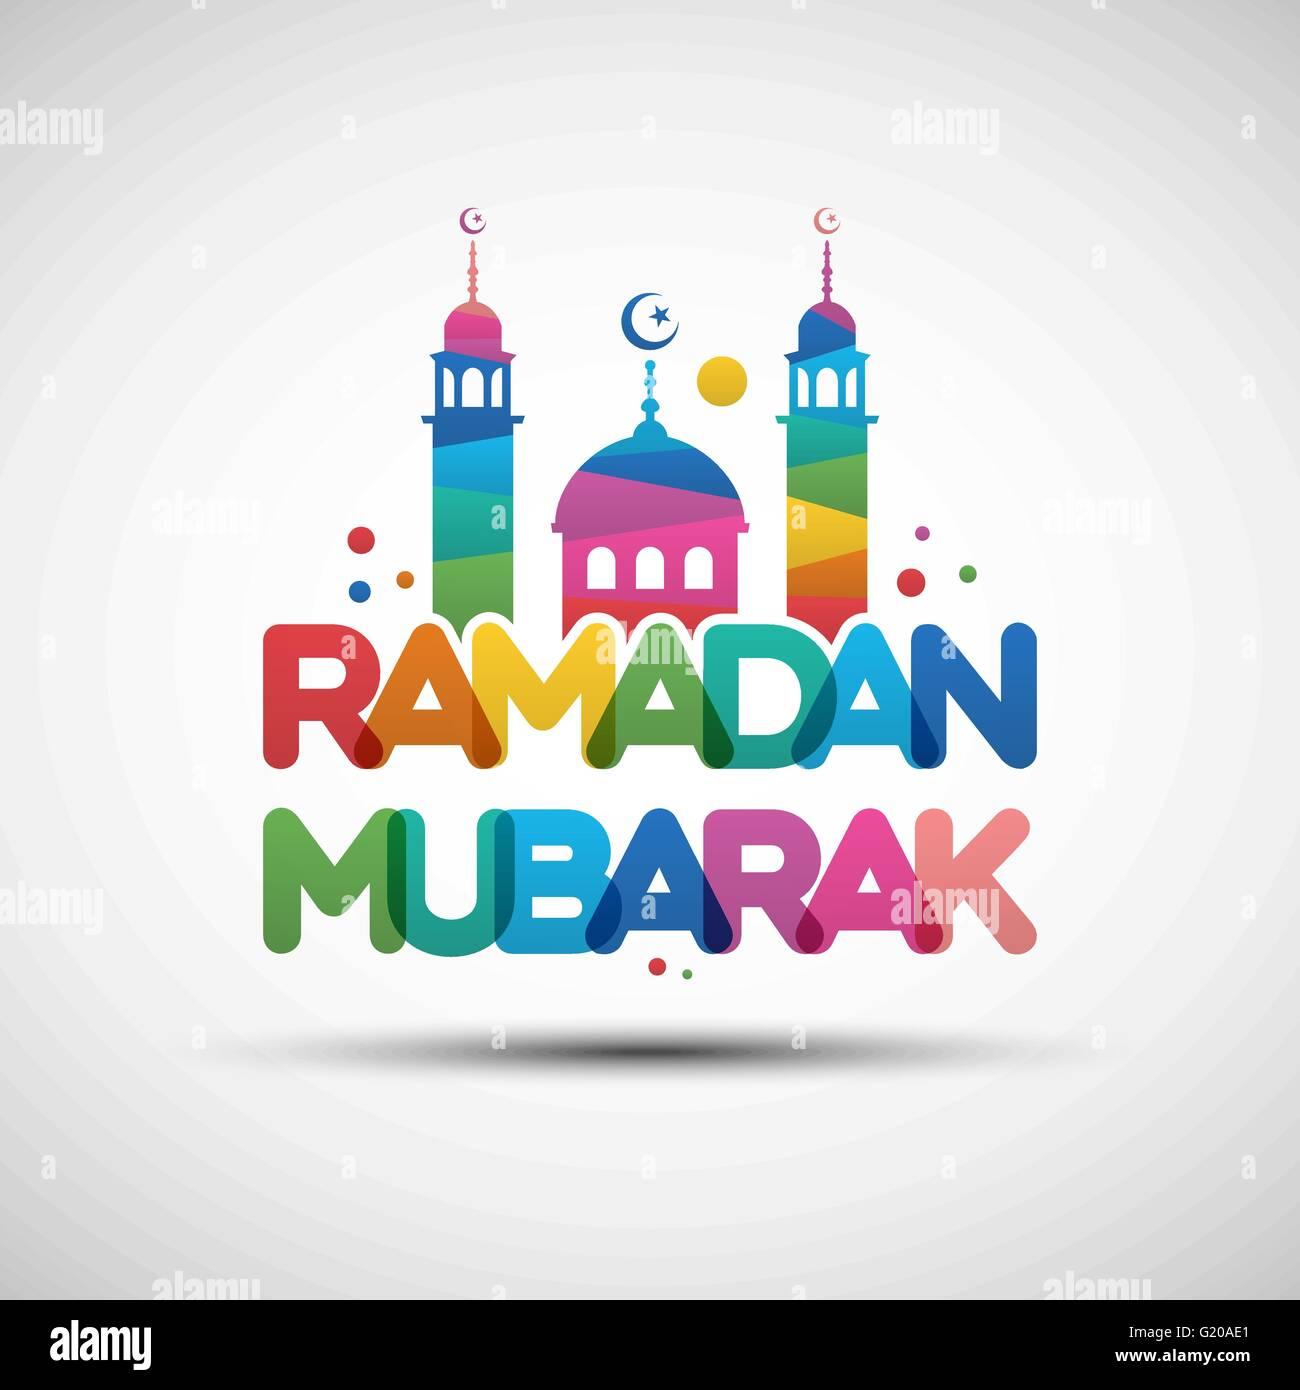 Eid mubarak greeting card typography stock photos eid mubarak vector illustration of ramadan mubarak greeting card design with creative multicolored transparent text stock kristyandbryce Images